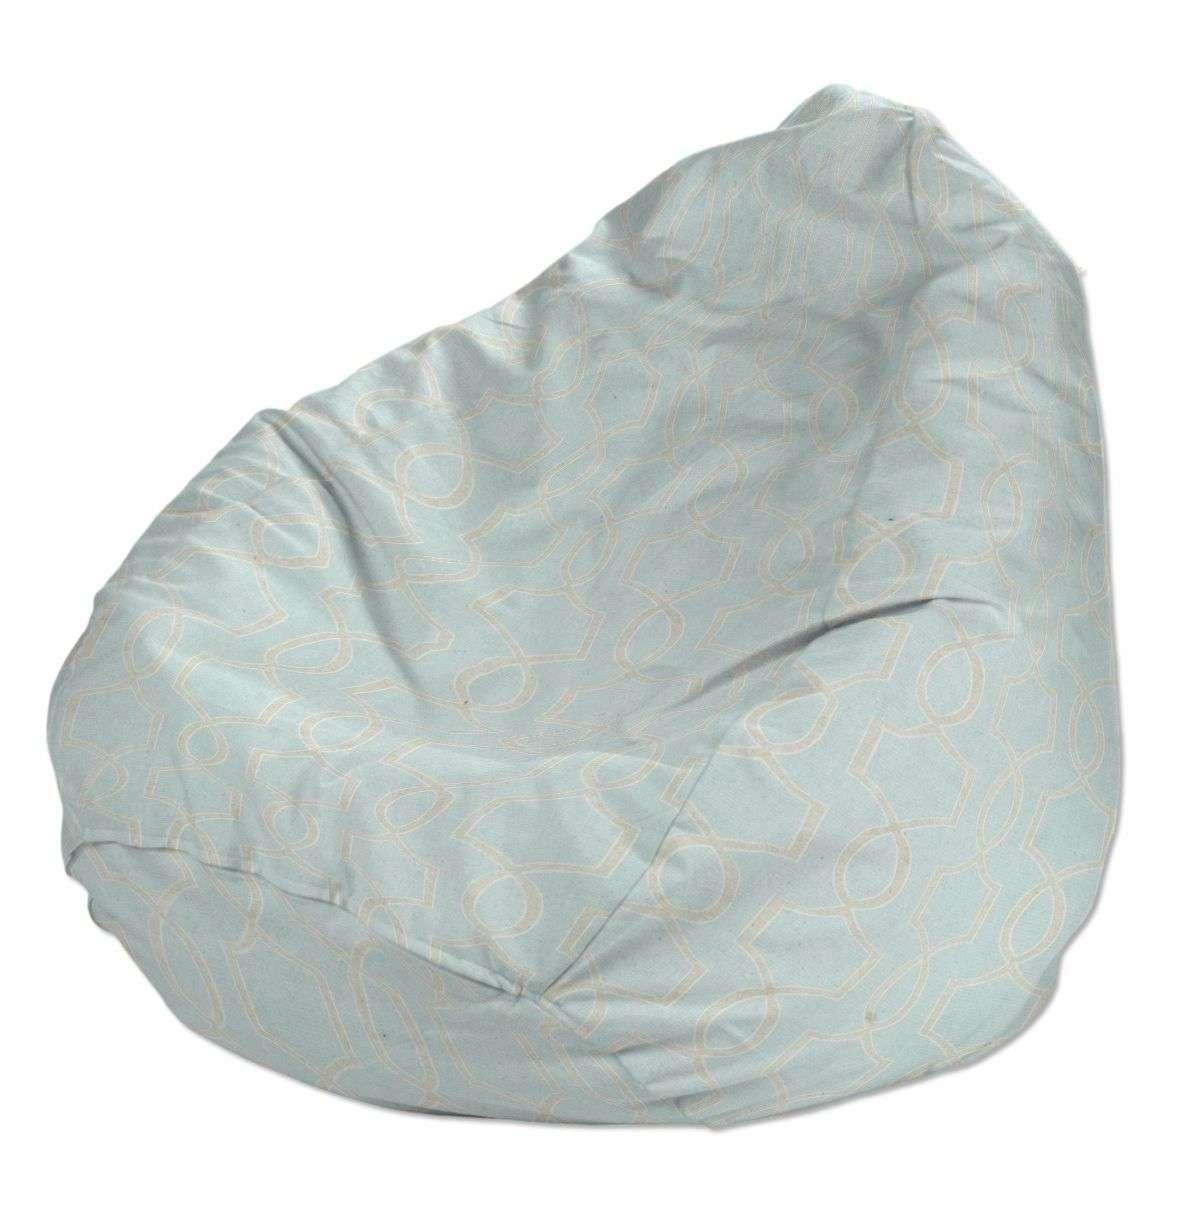 Sitzsack, grau-türkis, Ø50 × 85 cm, Comics | Wohnzimmer > Sessel > Sitzsaecke | Dekoria